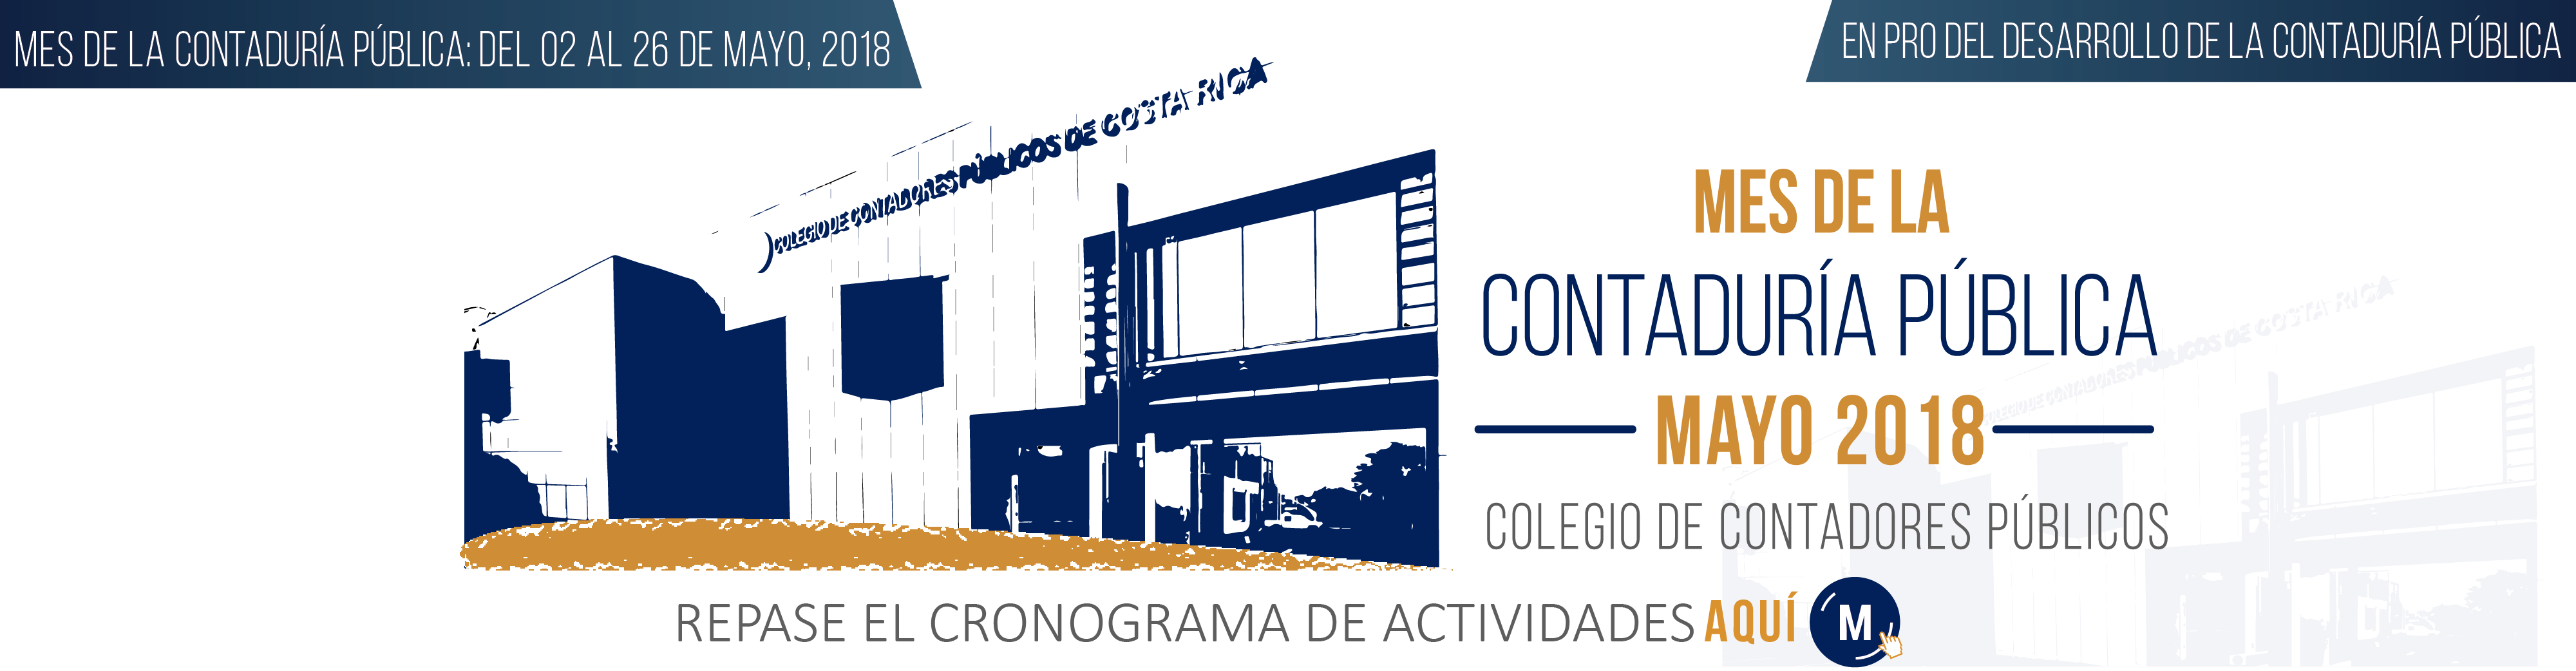 banner_web_mes_contaduria-01